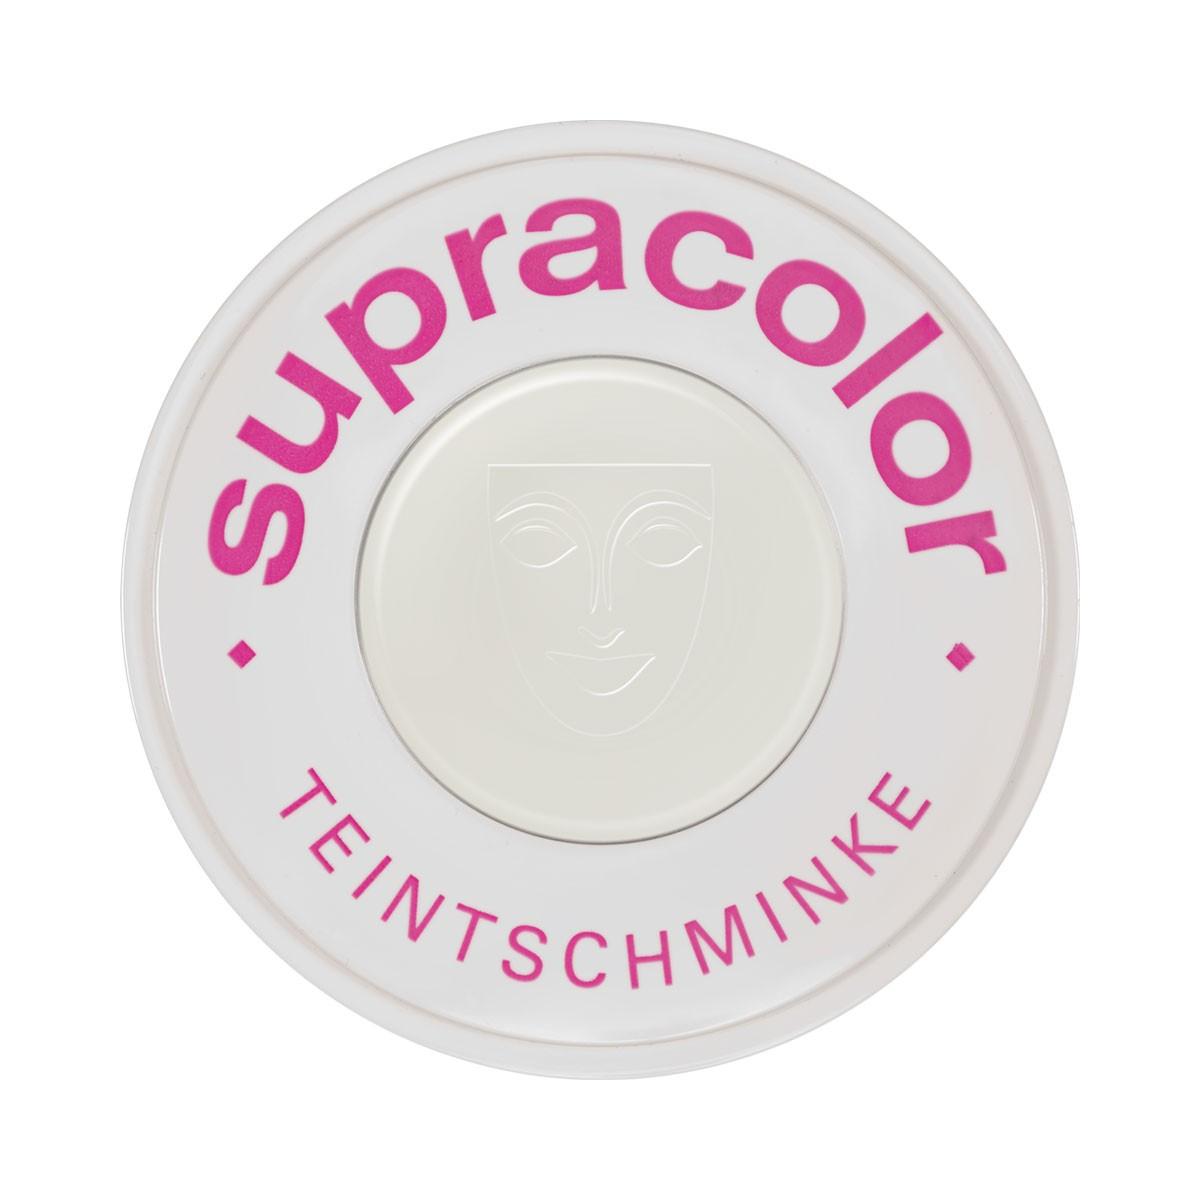 Supracolor 30 ml